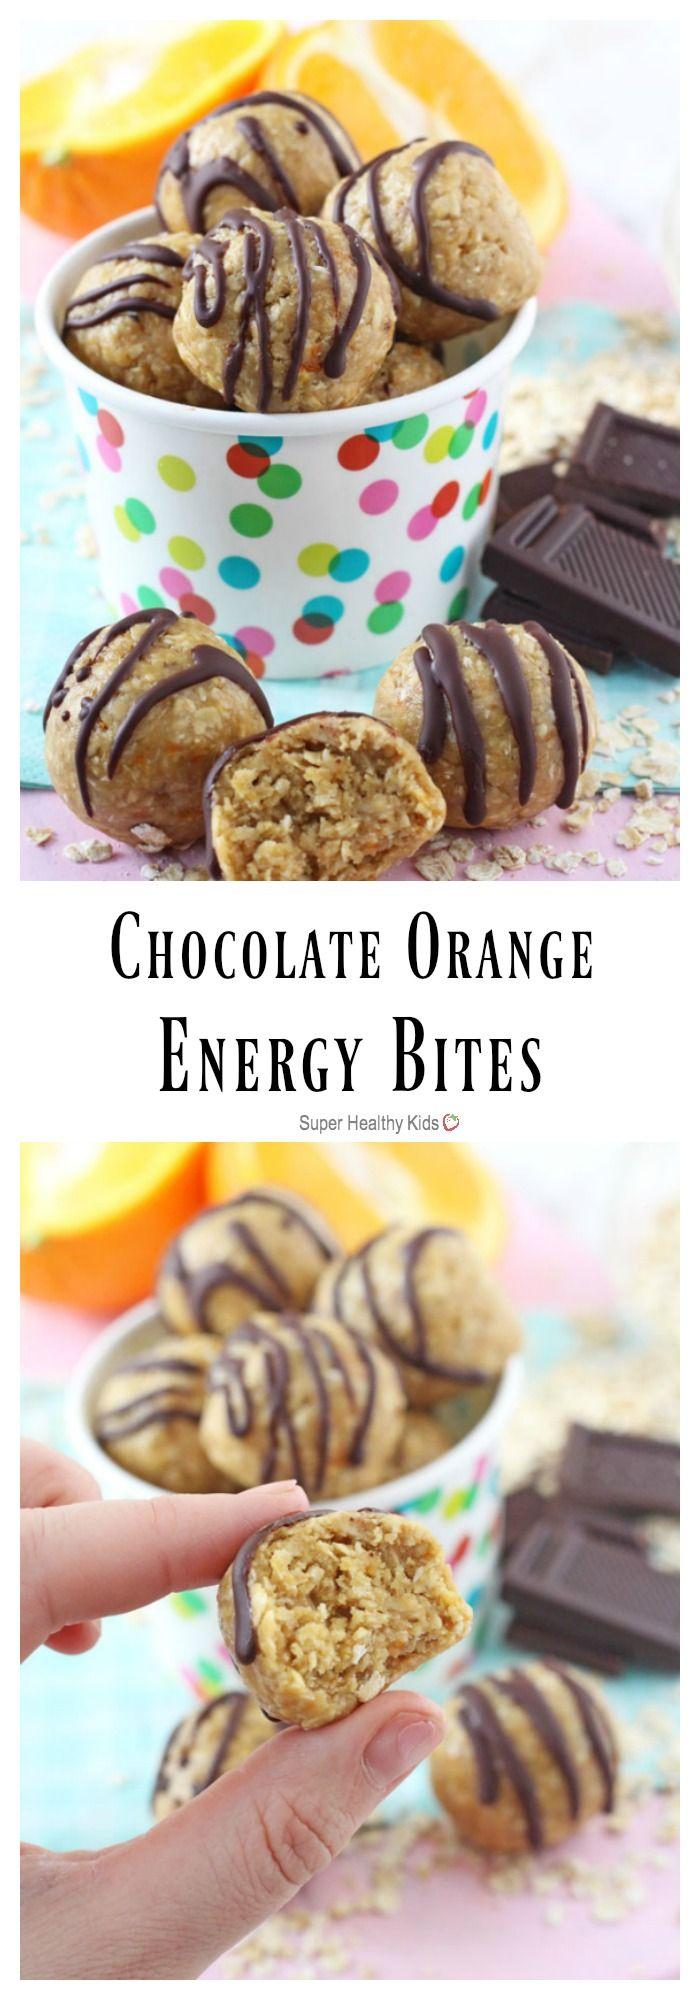 Chocolate Orange Energy Bites | Healthy Ideas for Kids